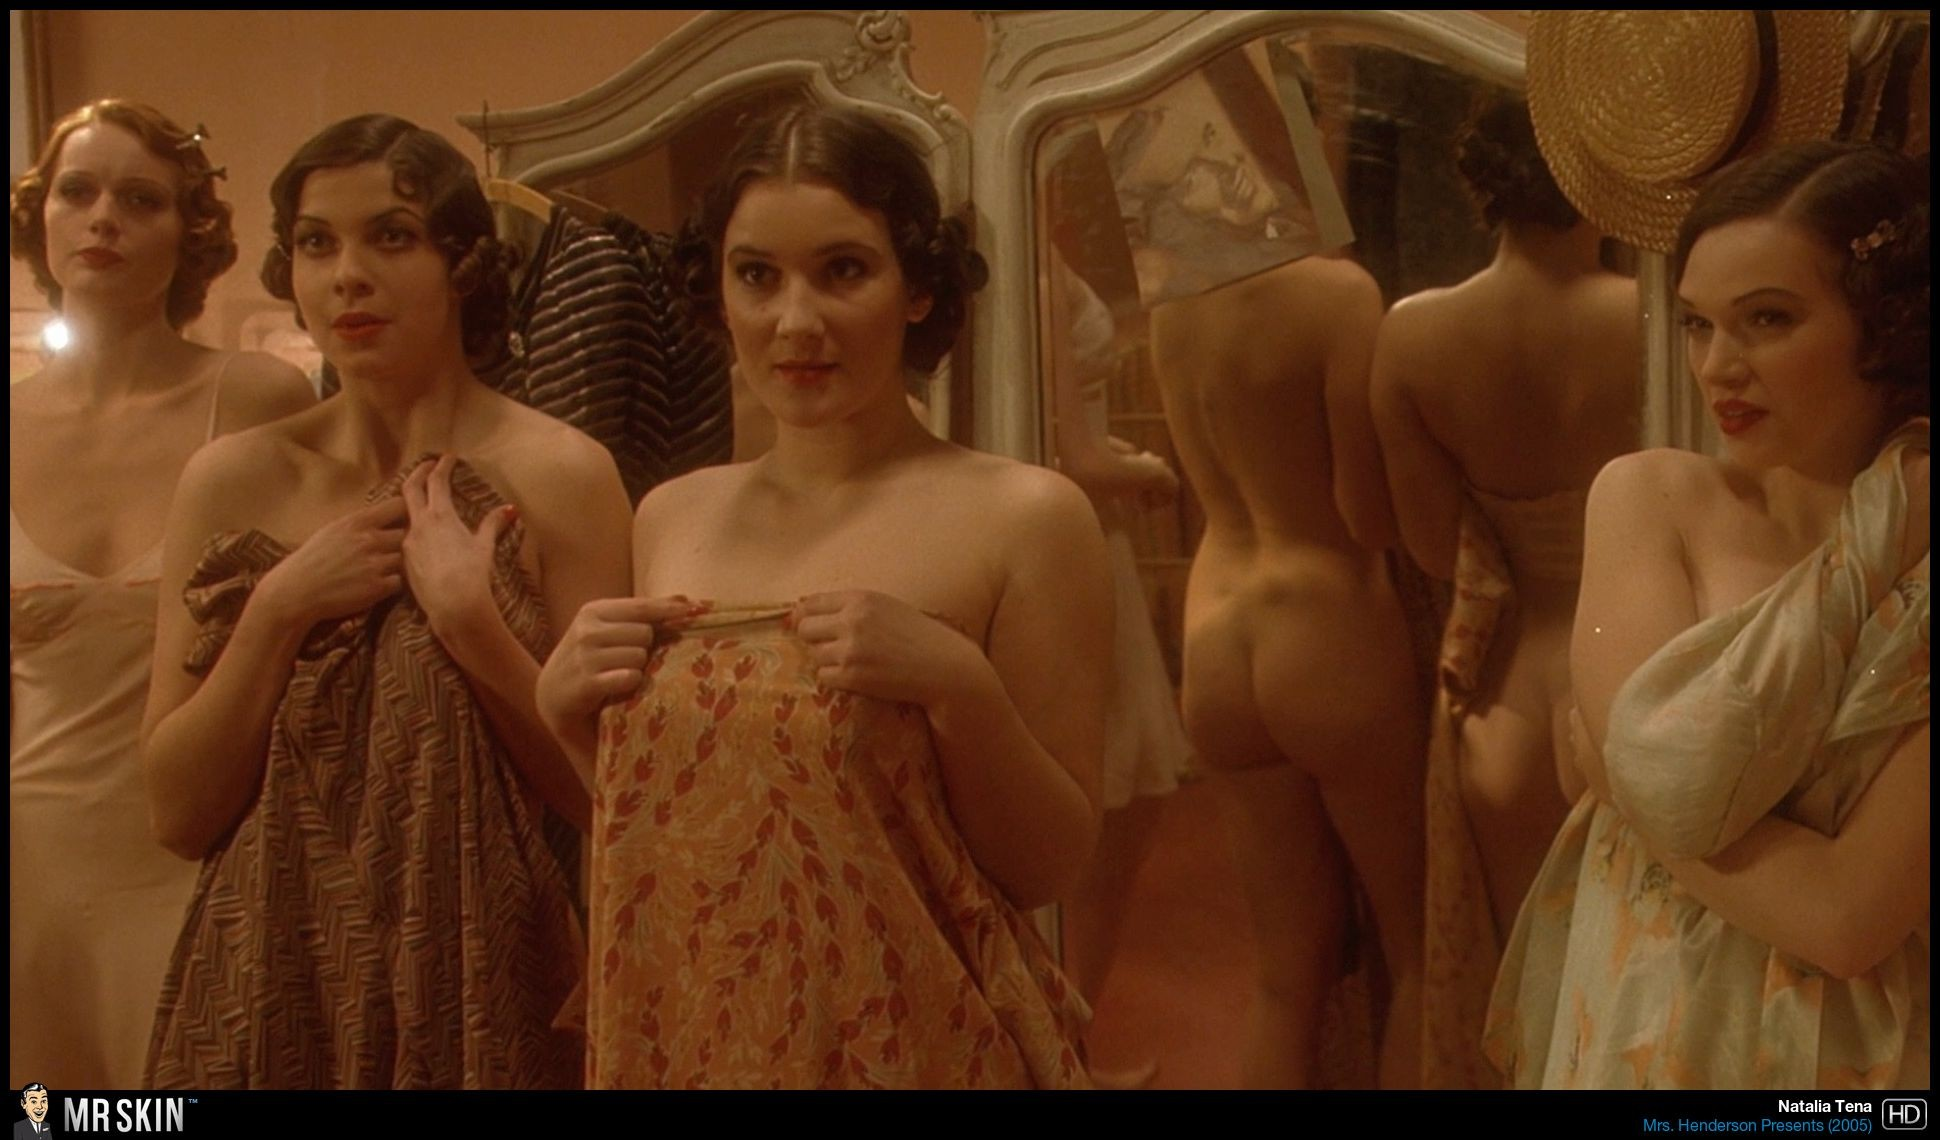 fotos de Natalia Tena desnuda